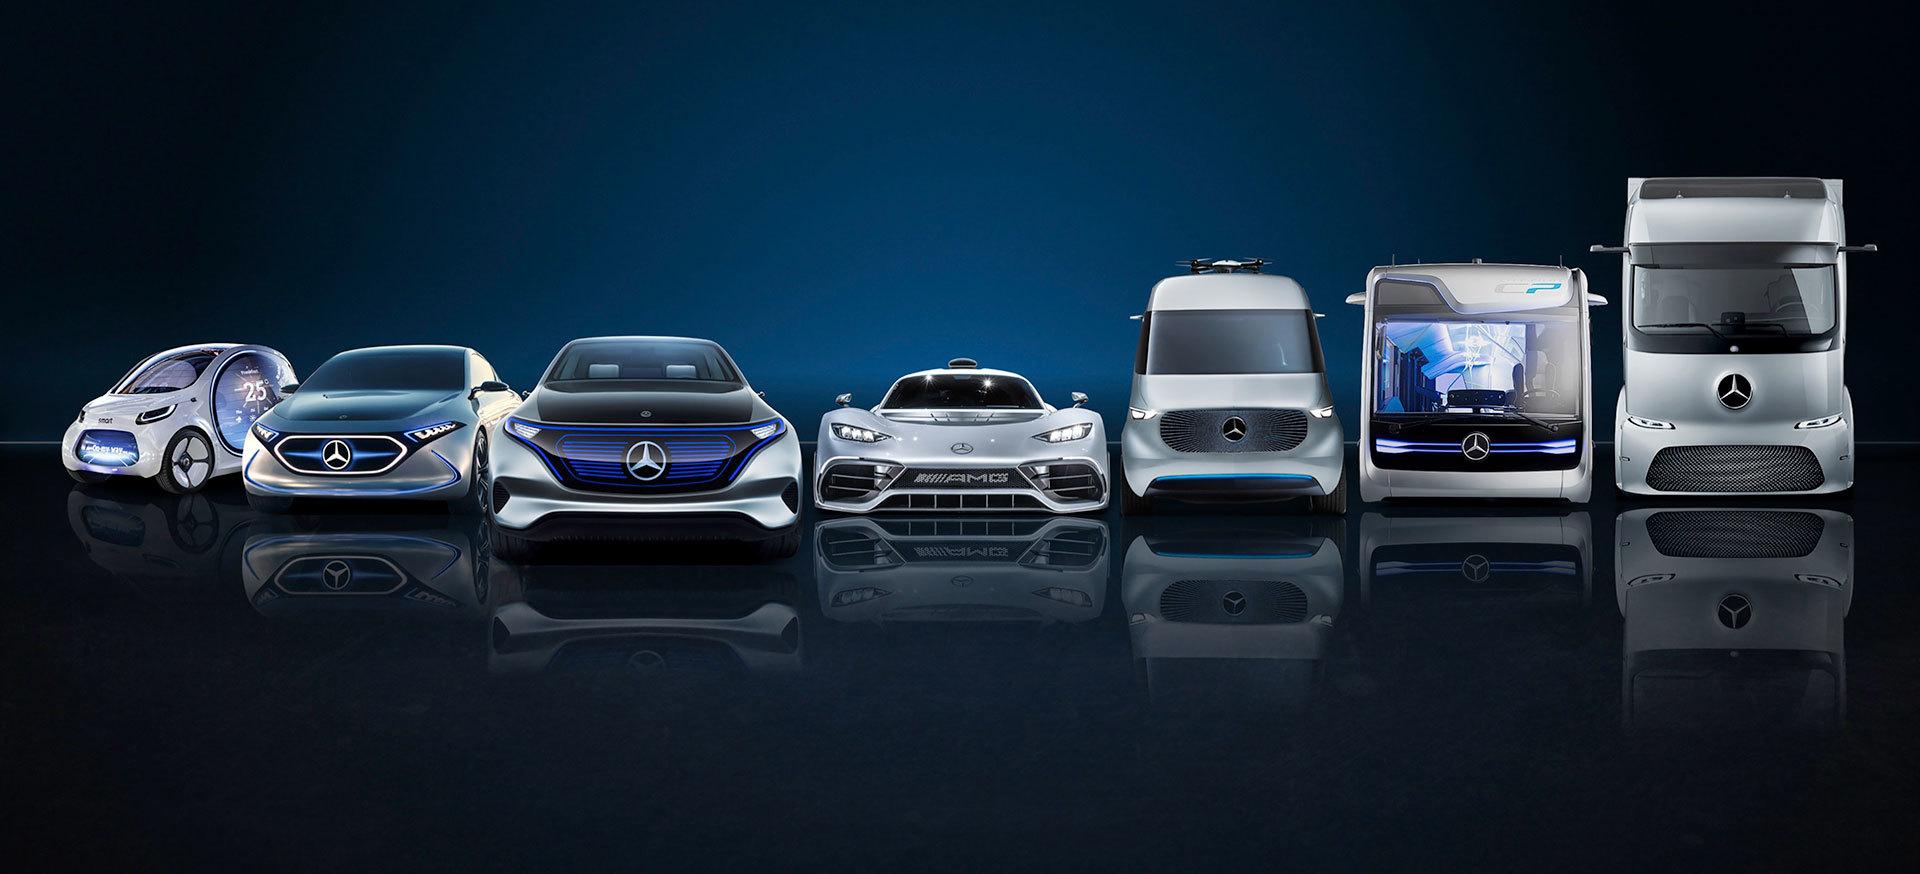 Mercedes Baterias Para Millones Coches Electricos